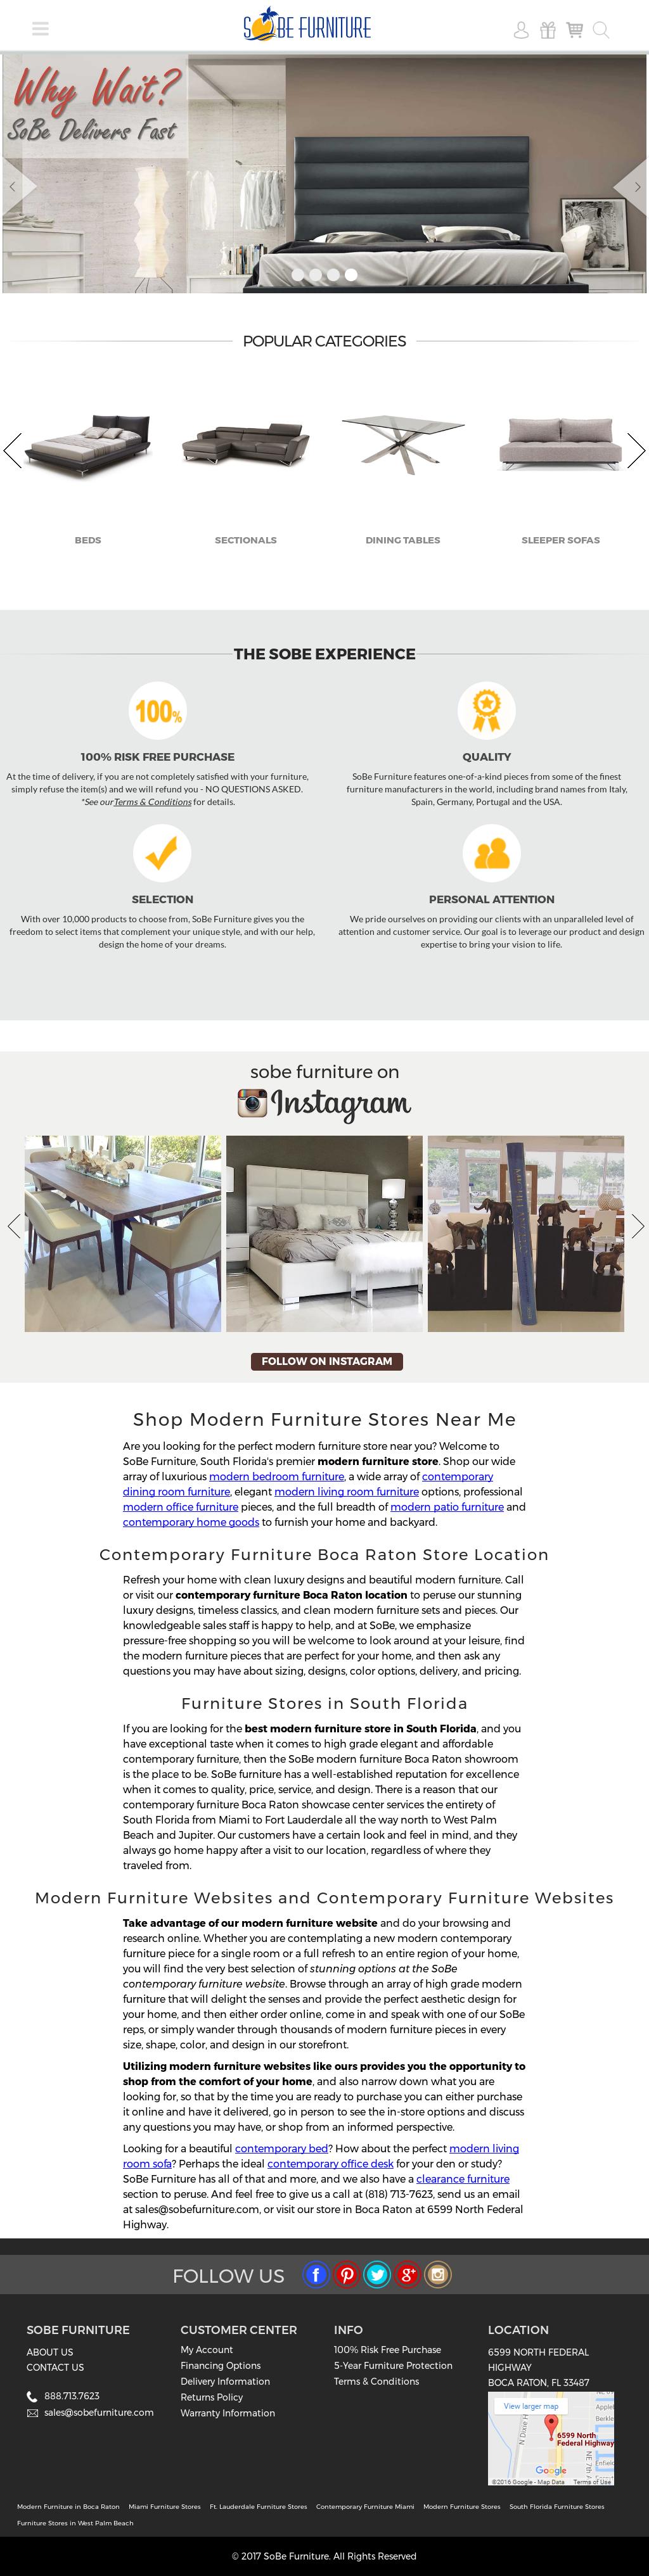 Sobe Furnitureu0027s Website Screenshot On Jul 2017